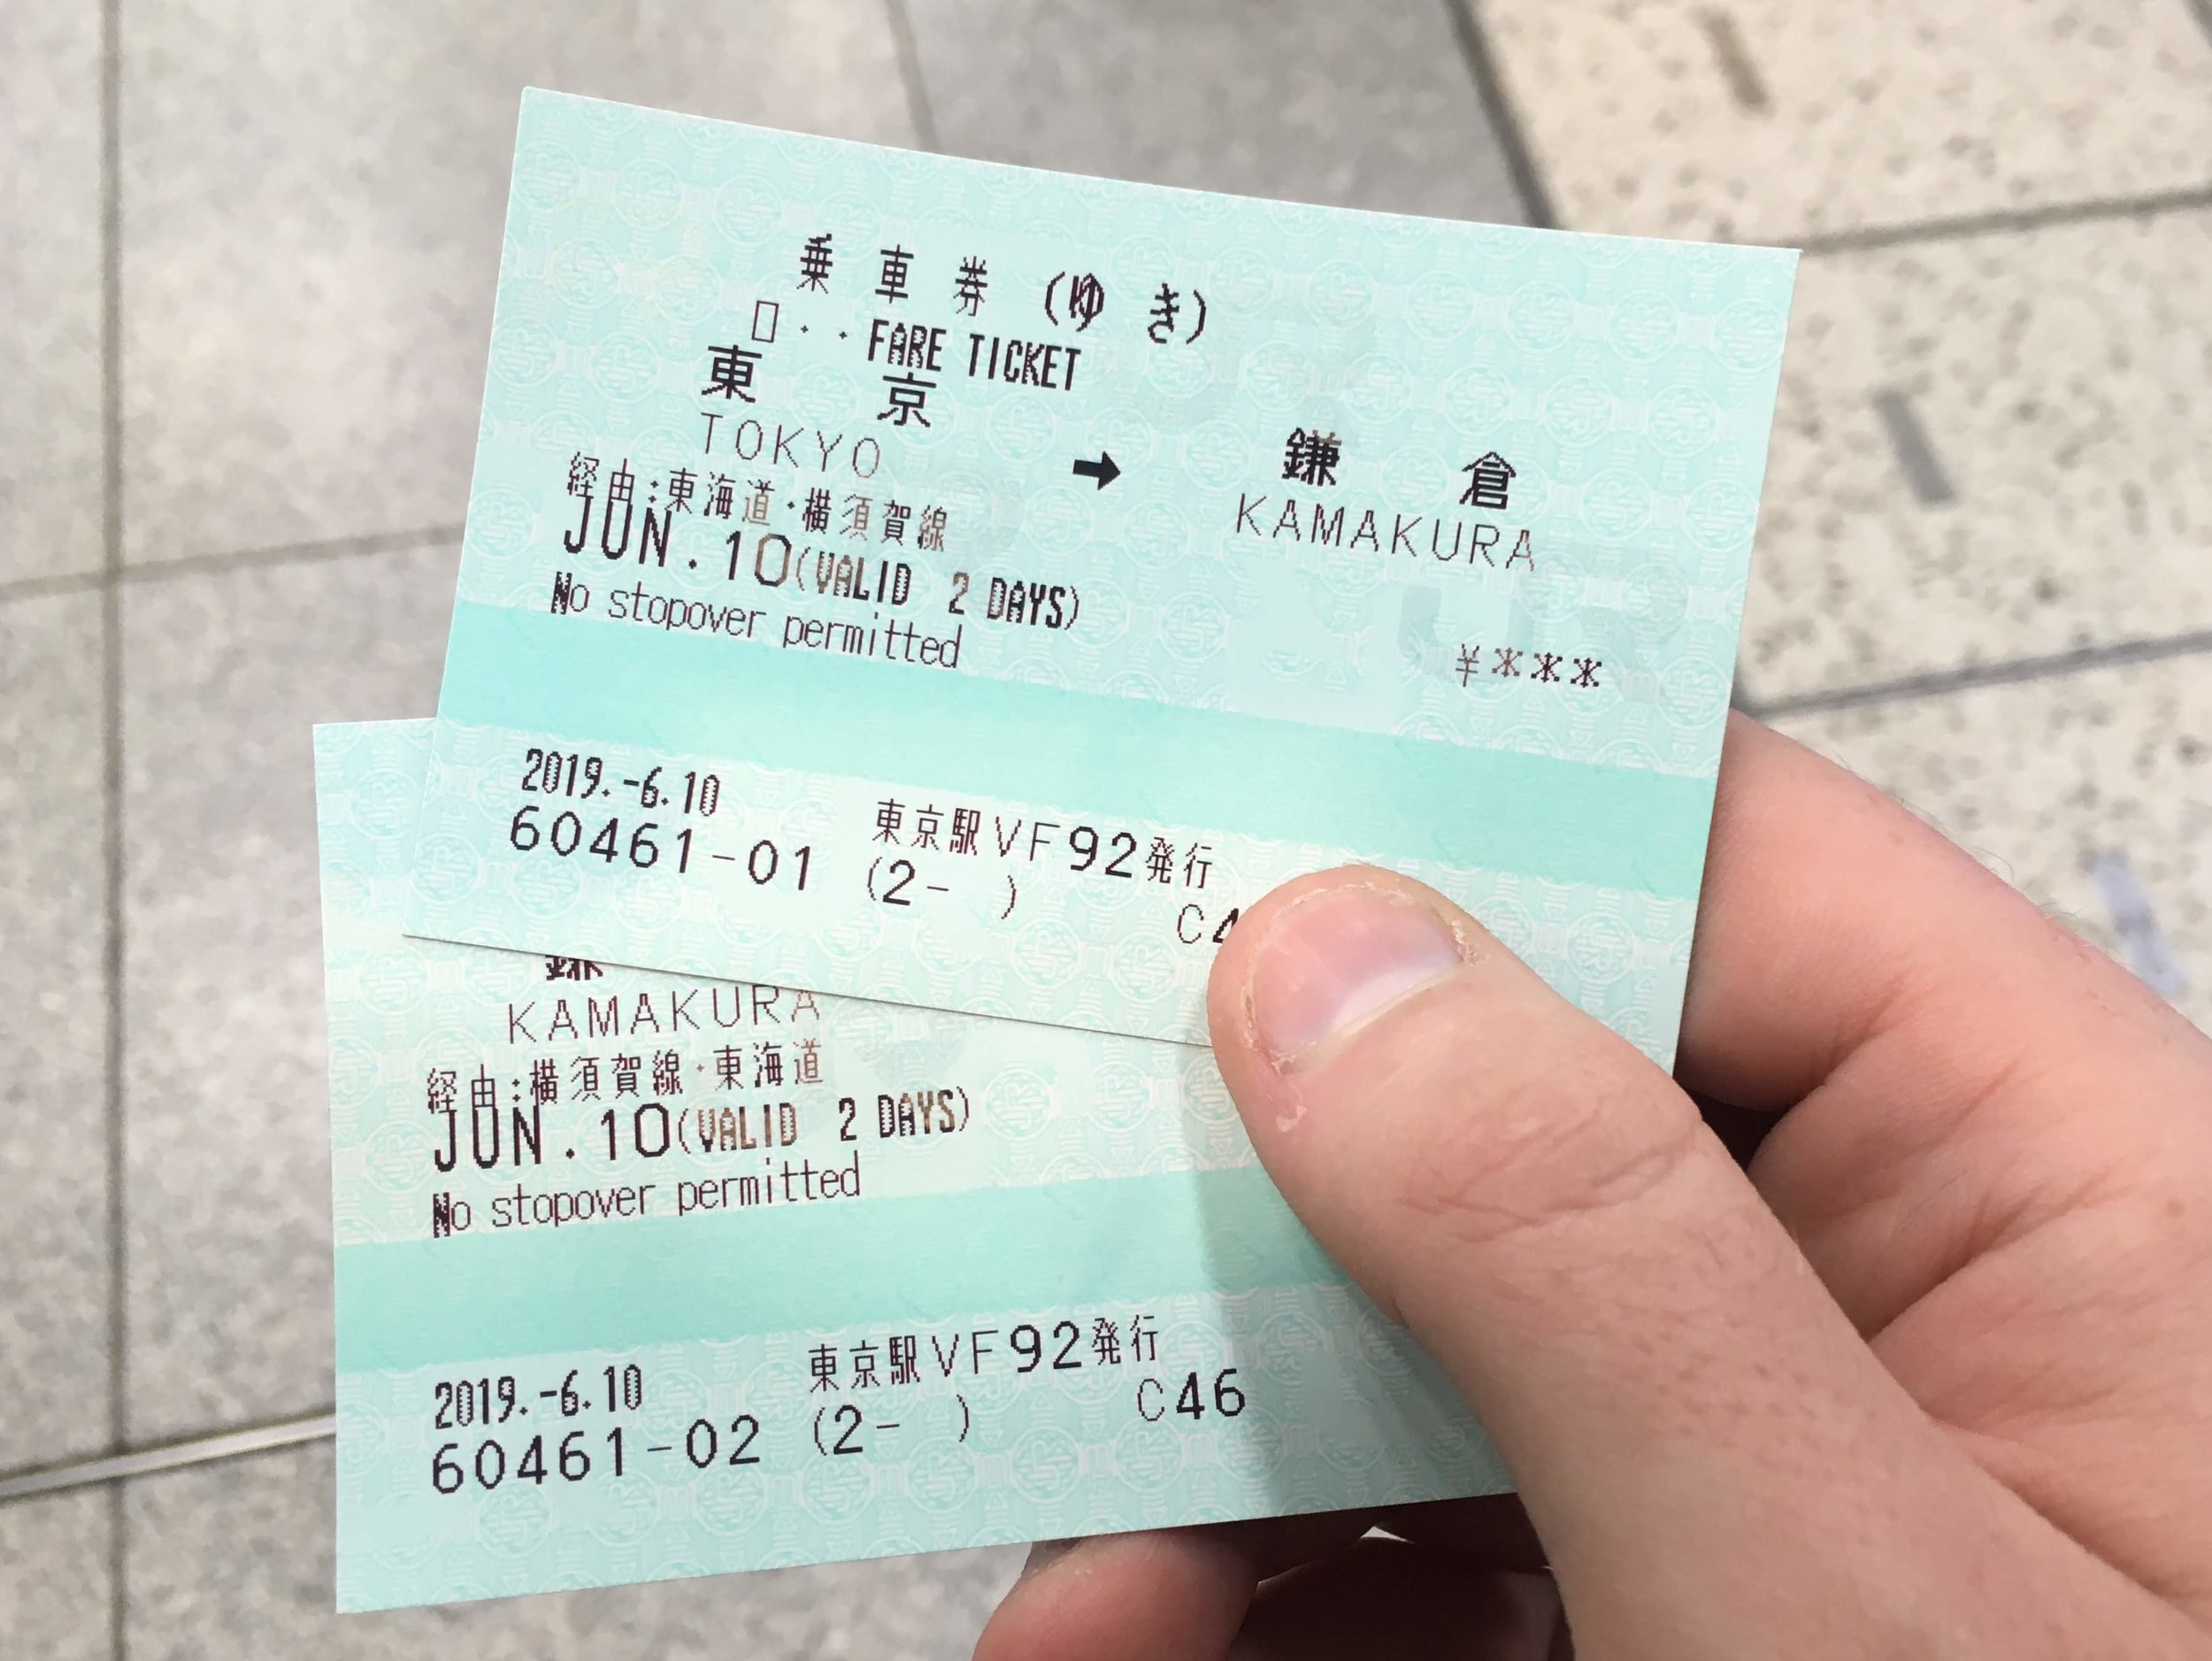 train ticket from Tokyo to Kamakura, Japan